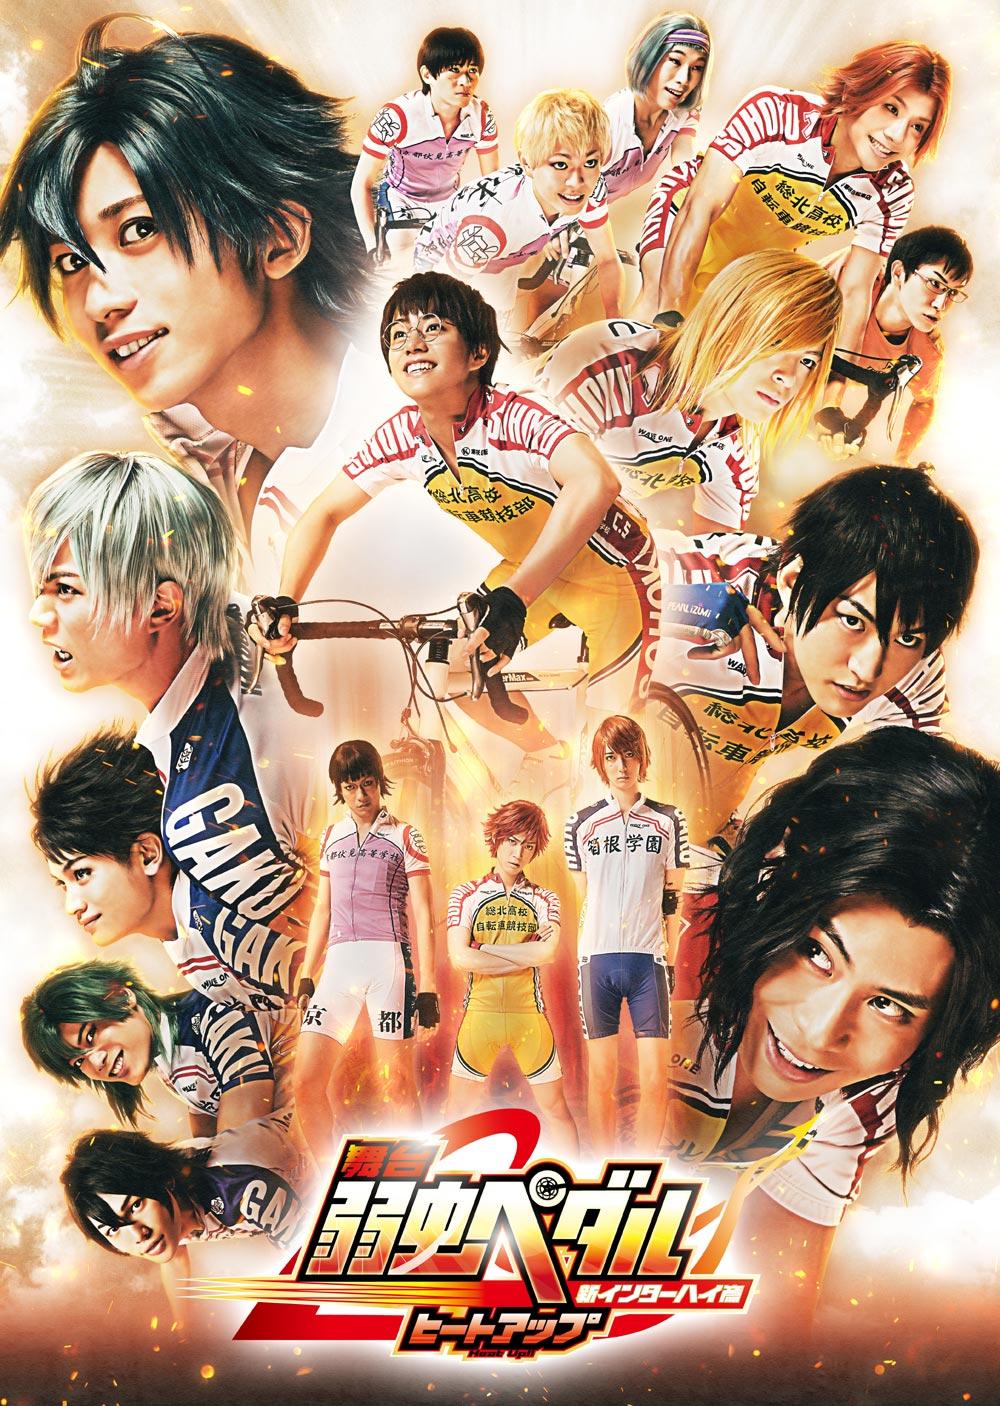 【Web予約分】舞台『弱虫ペダル』新インターハイ篇〜ヒートアップ〜 Blu-ray